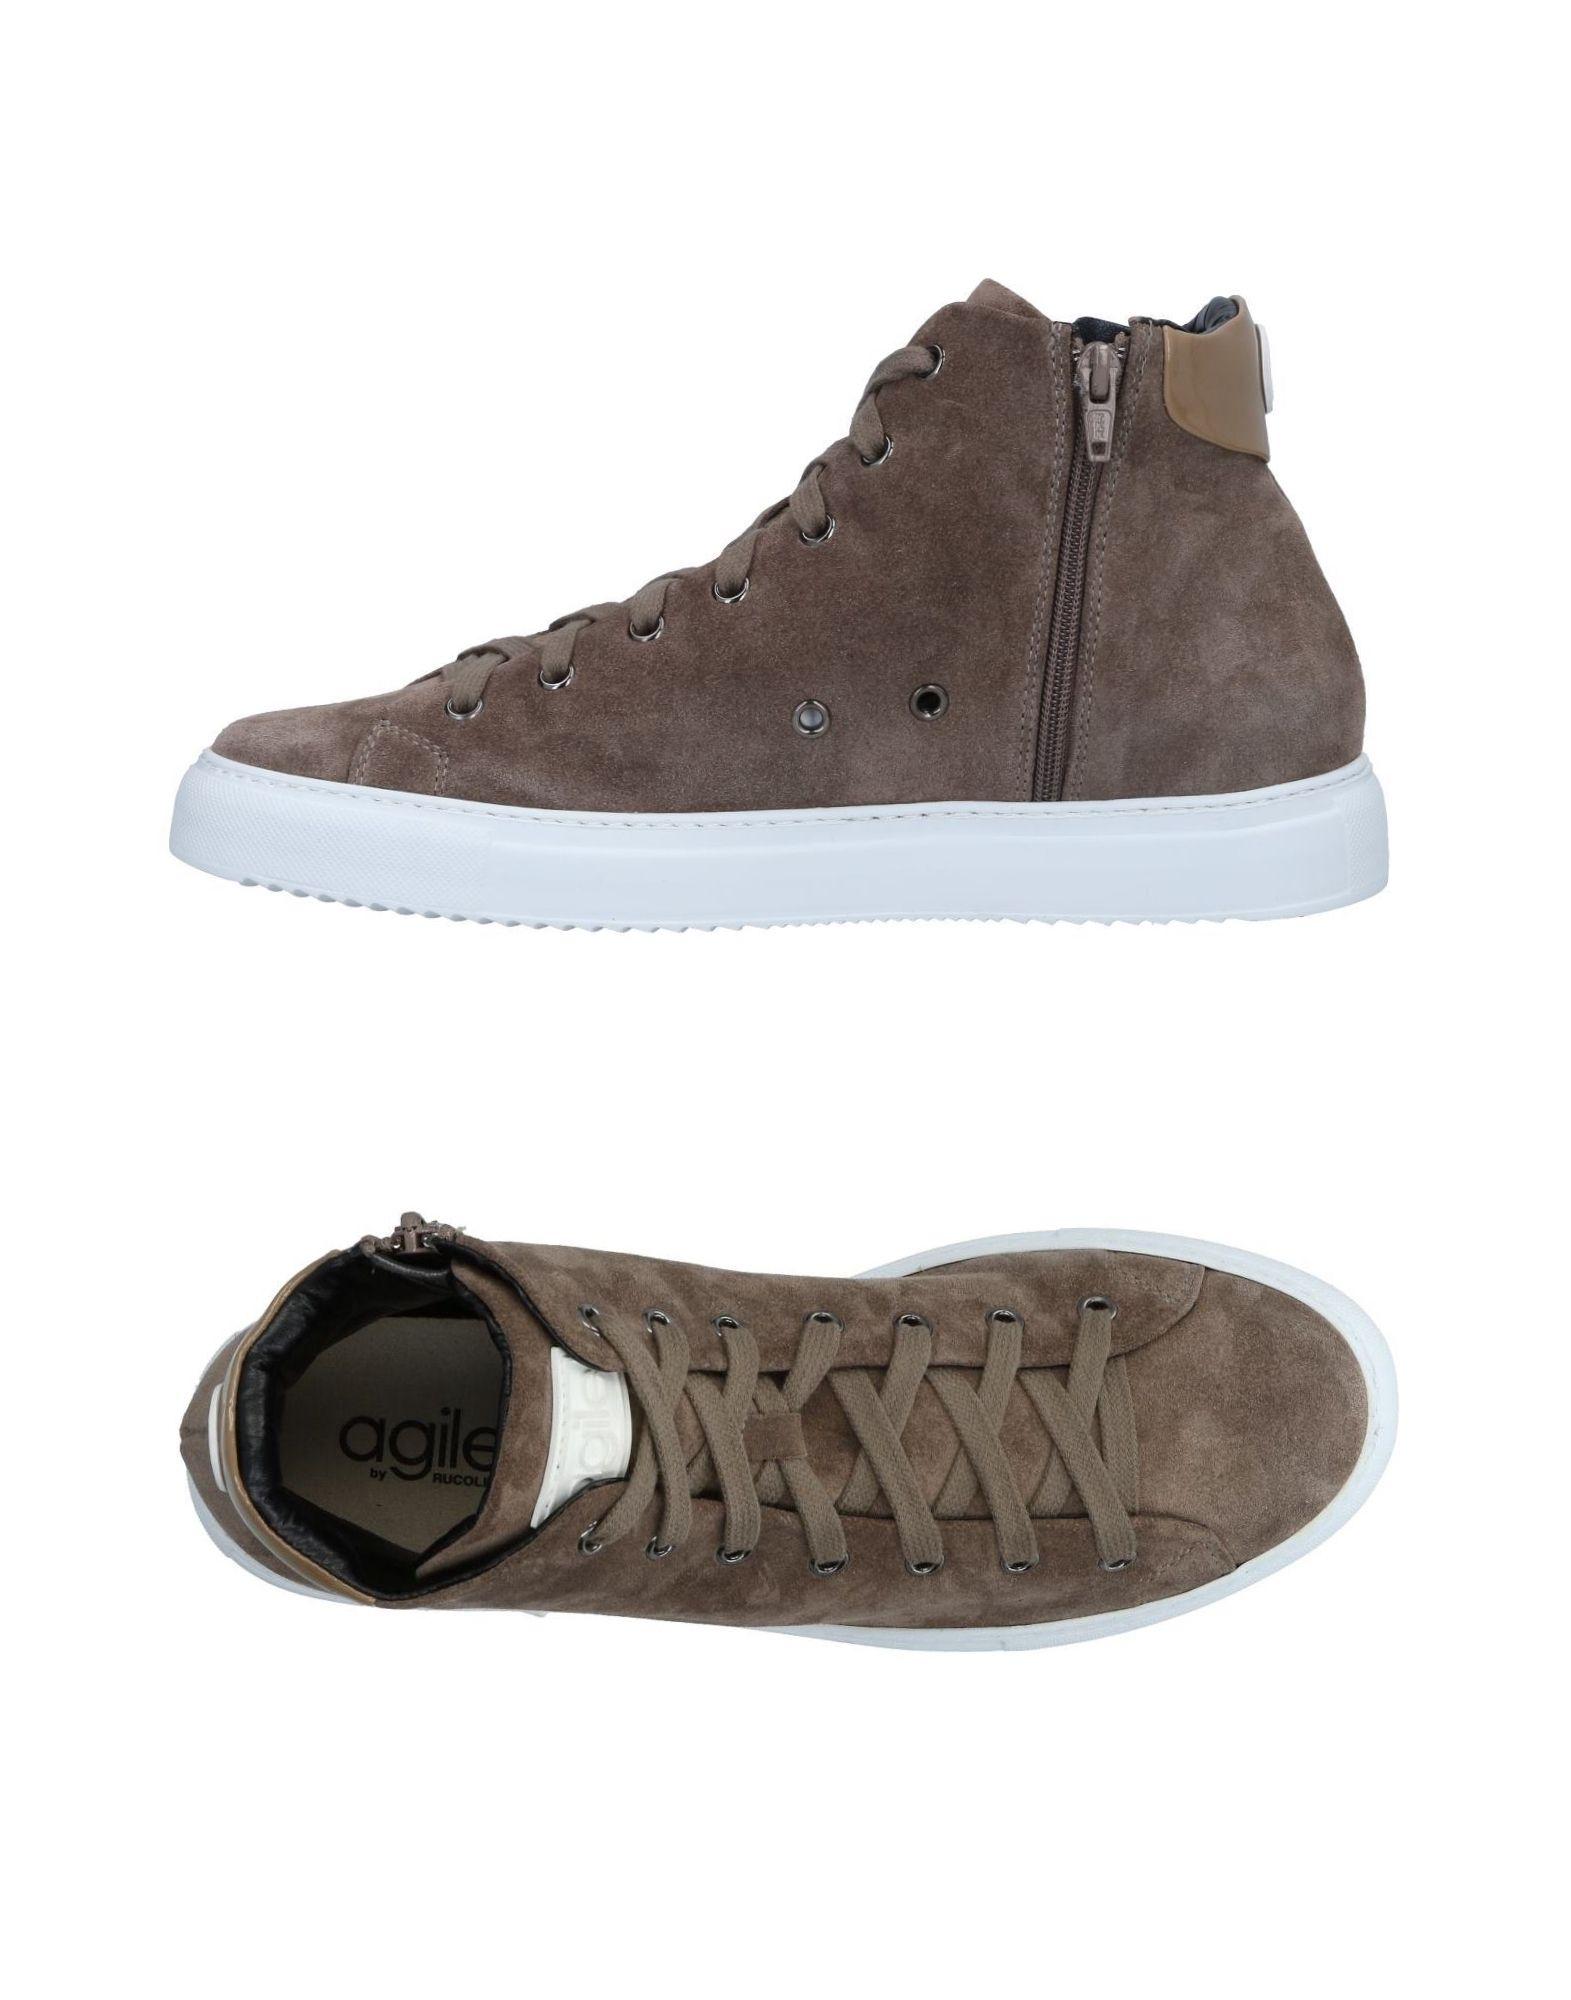 Agile By Rucoline Sneakers Damen  11496047HX Gute Qualität beliebte Schuhe